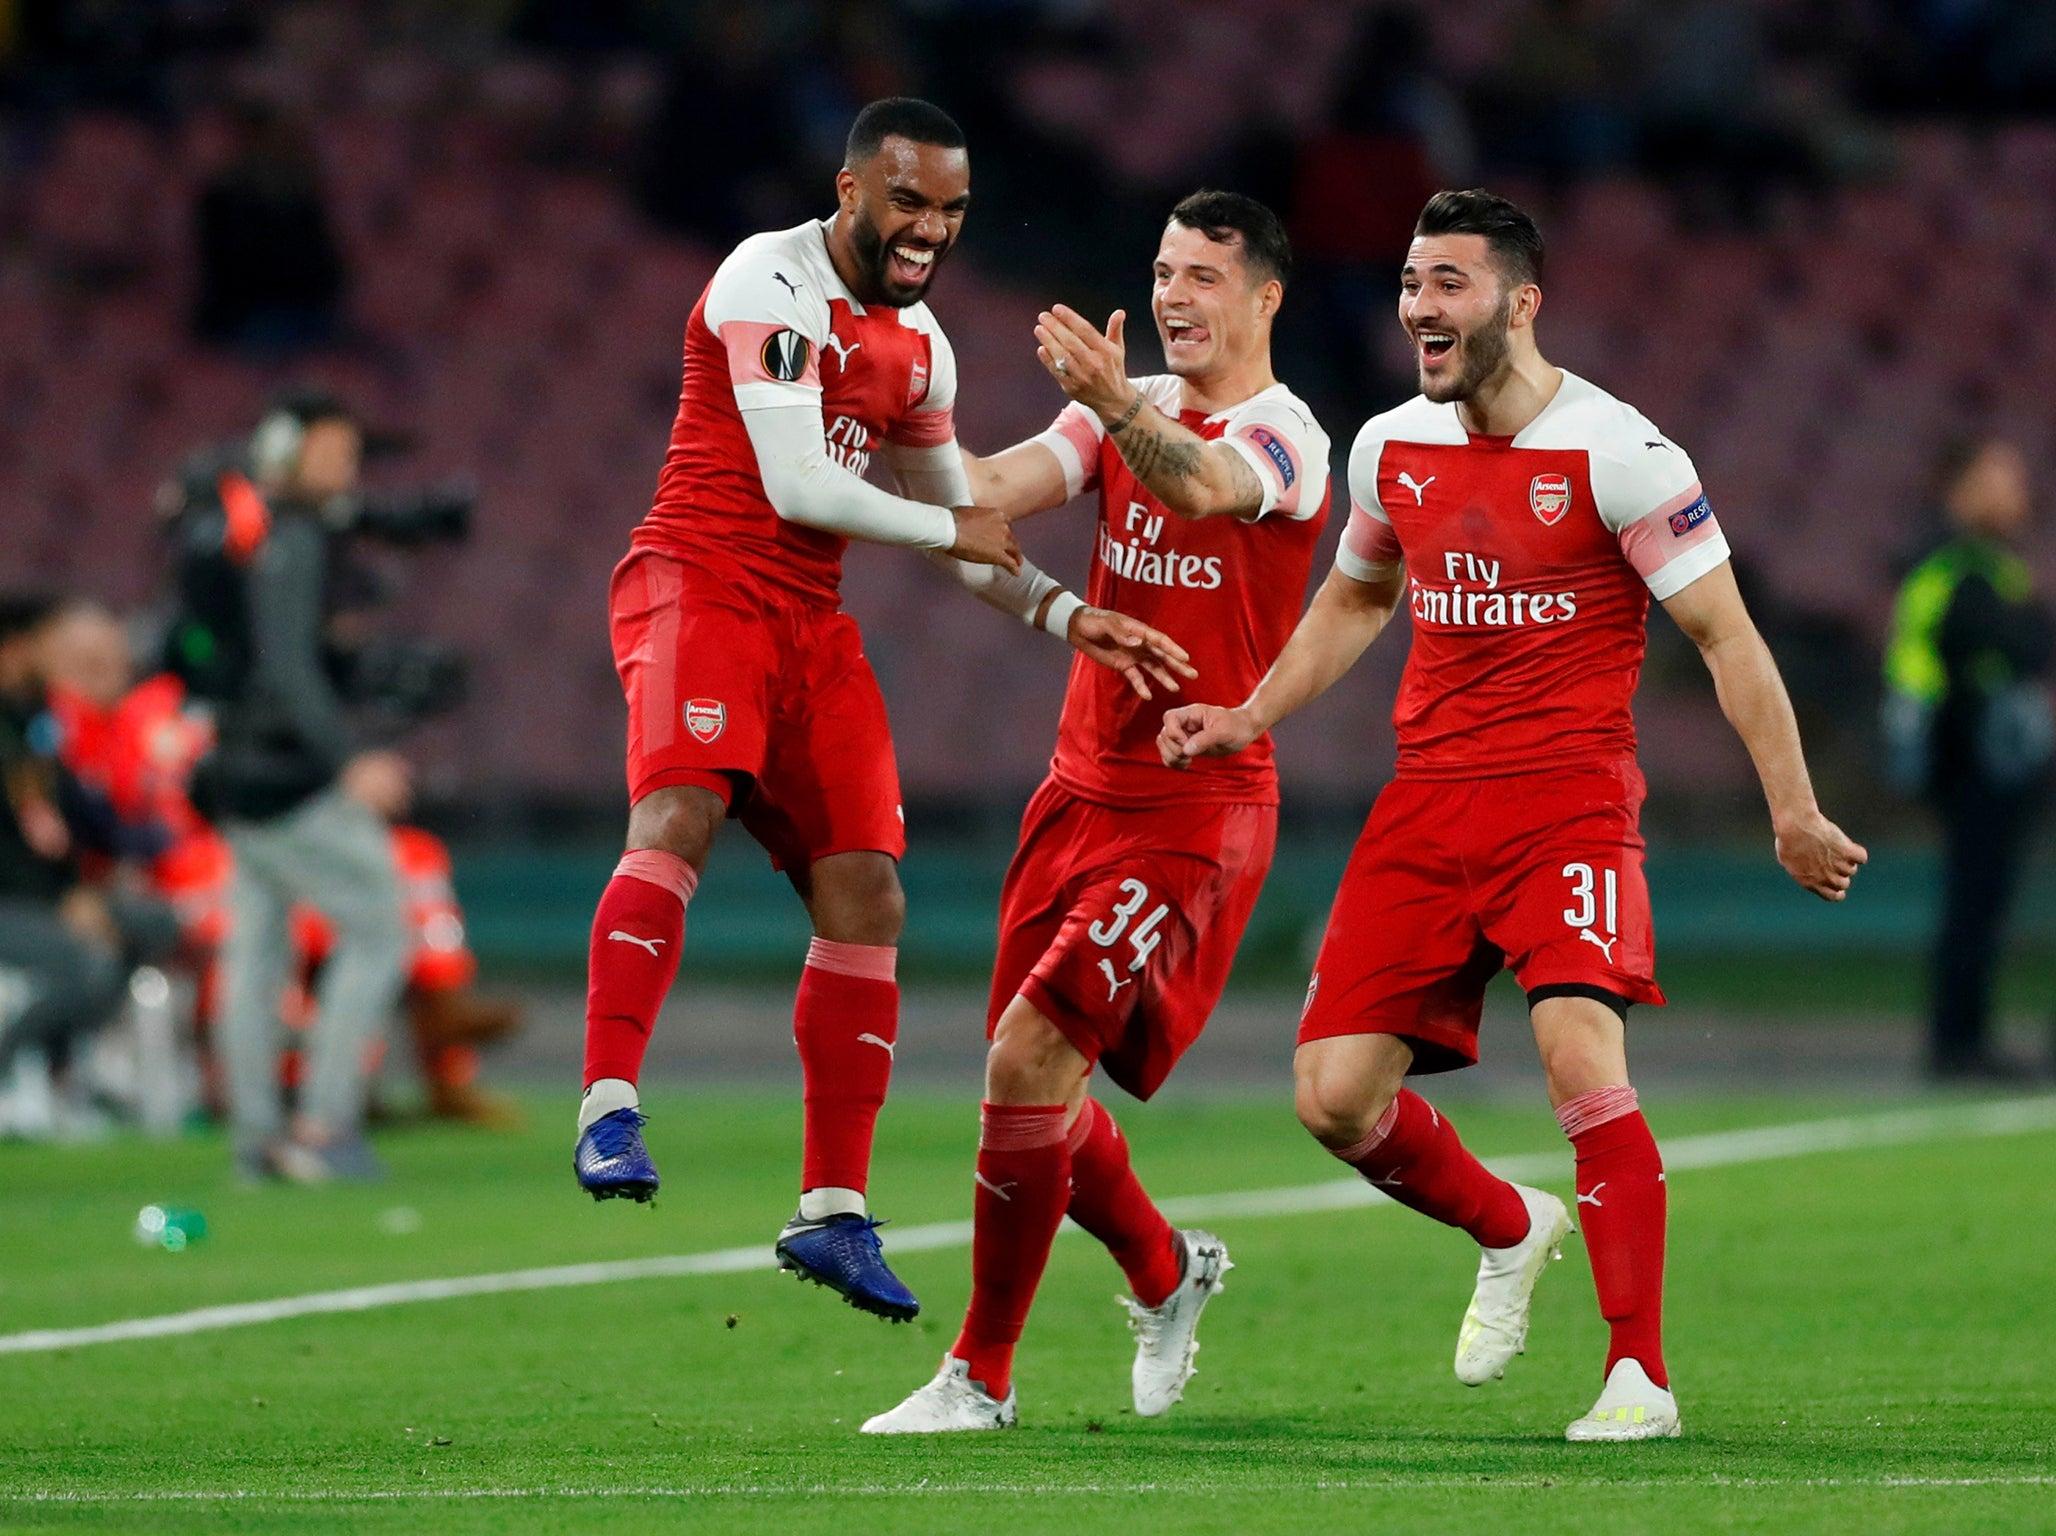 Napoli vs Arsenal result: Alexandre Lacazette free-kick eases Gunners into Europa League final four